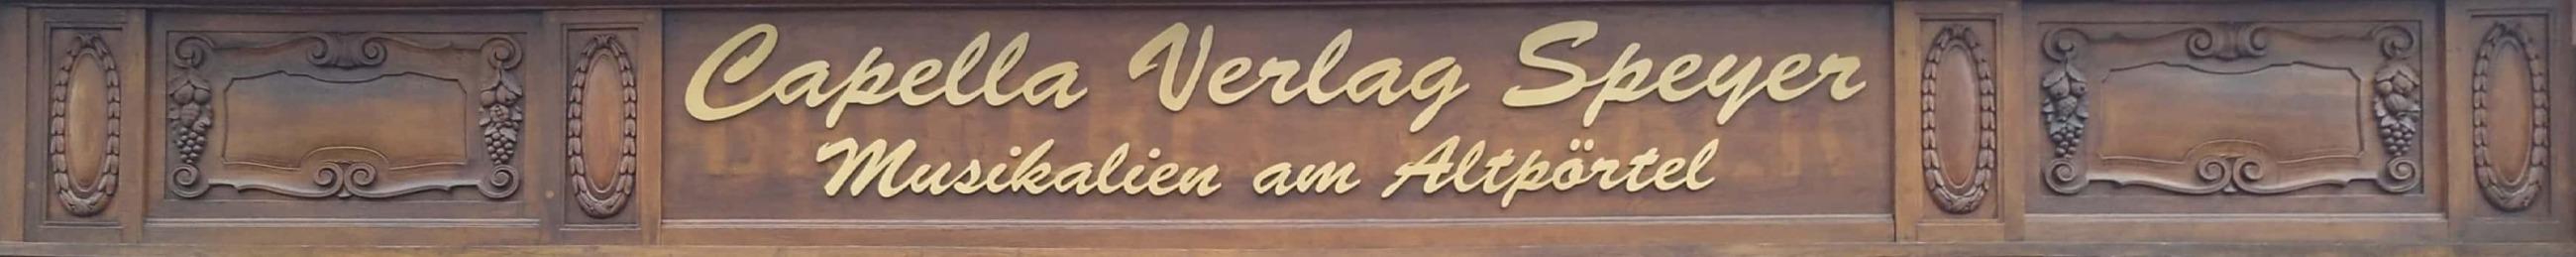 Capella Verlag Speyer